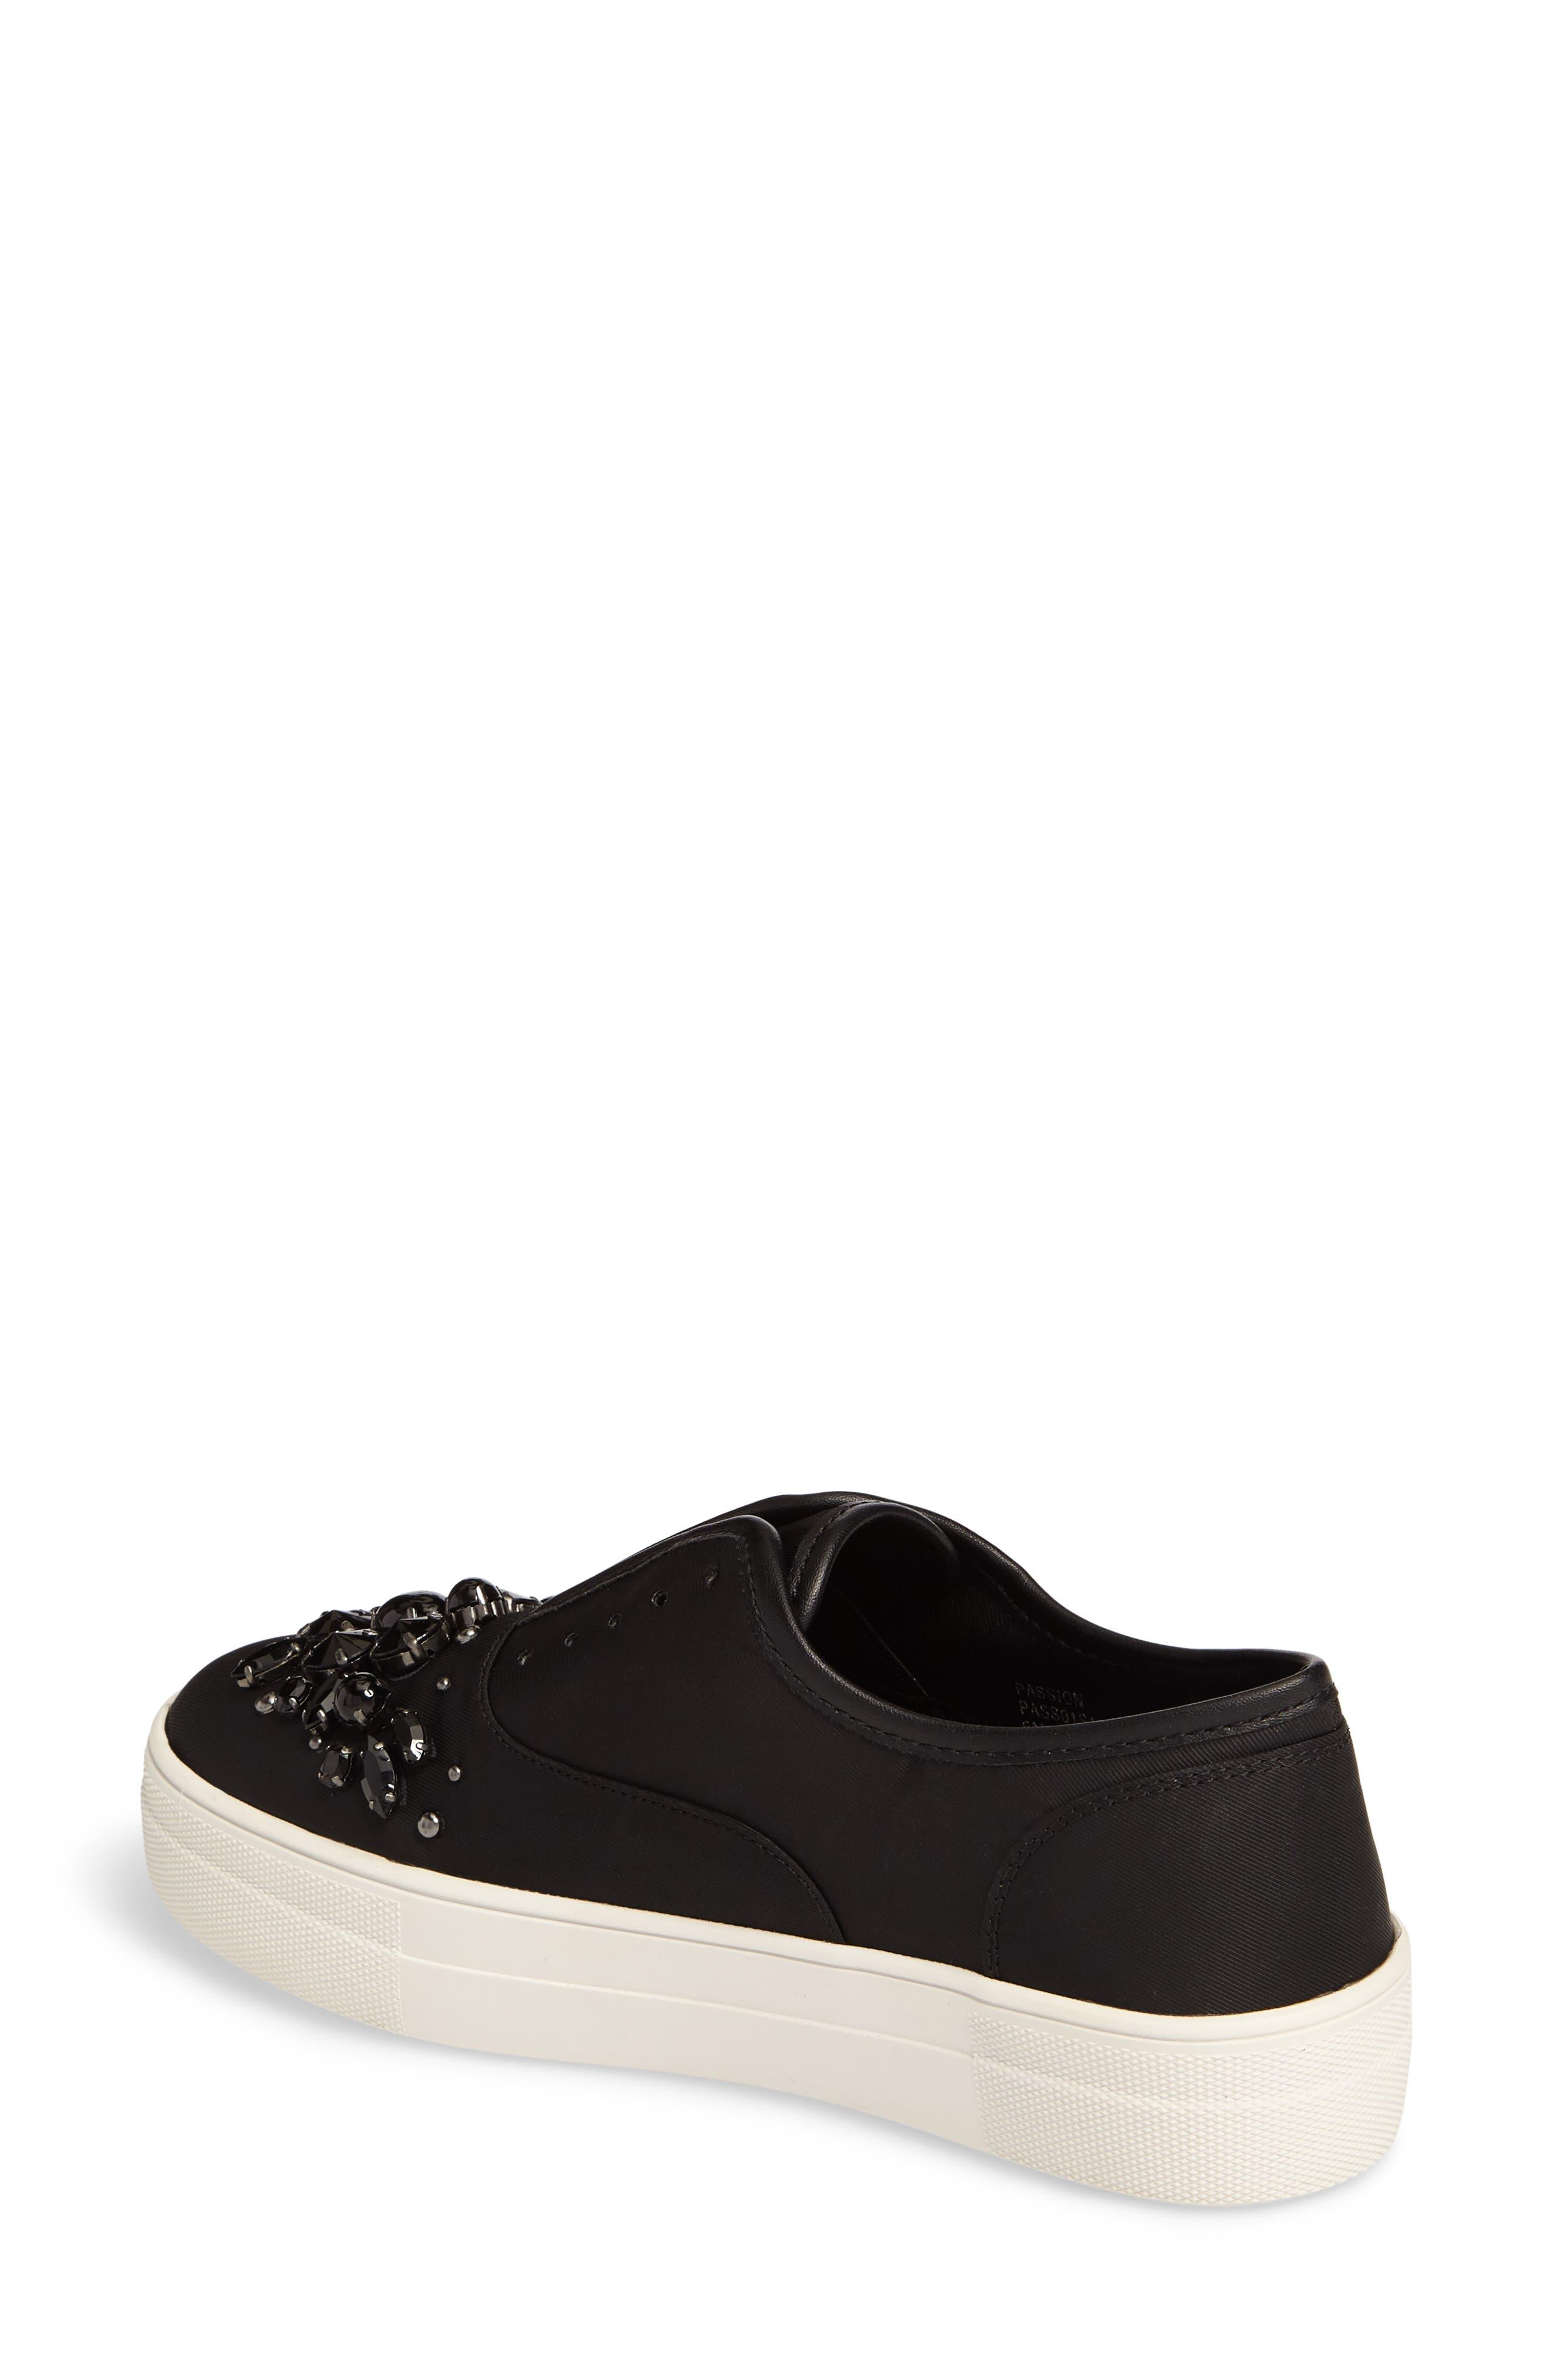 Alternate Image 2  - Steve Madden Passion Embellished Slip-On Platform Sneaker (Women)